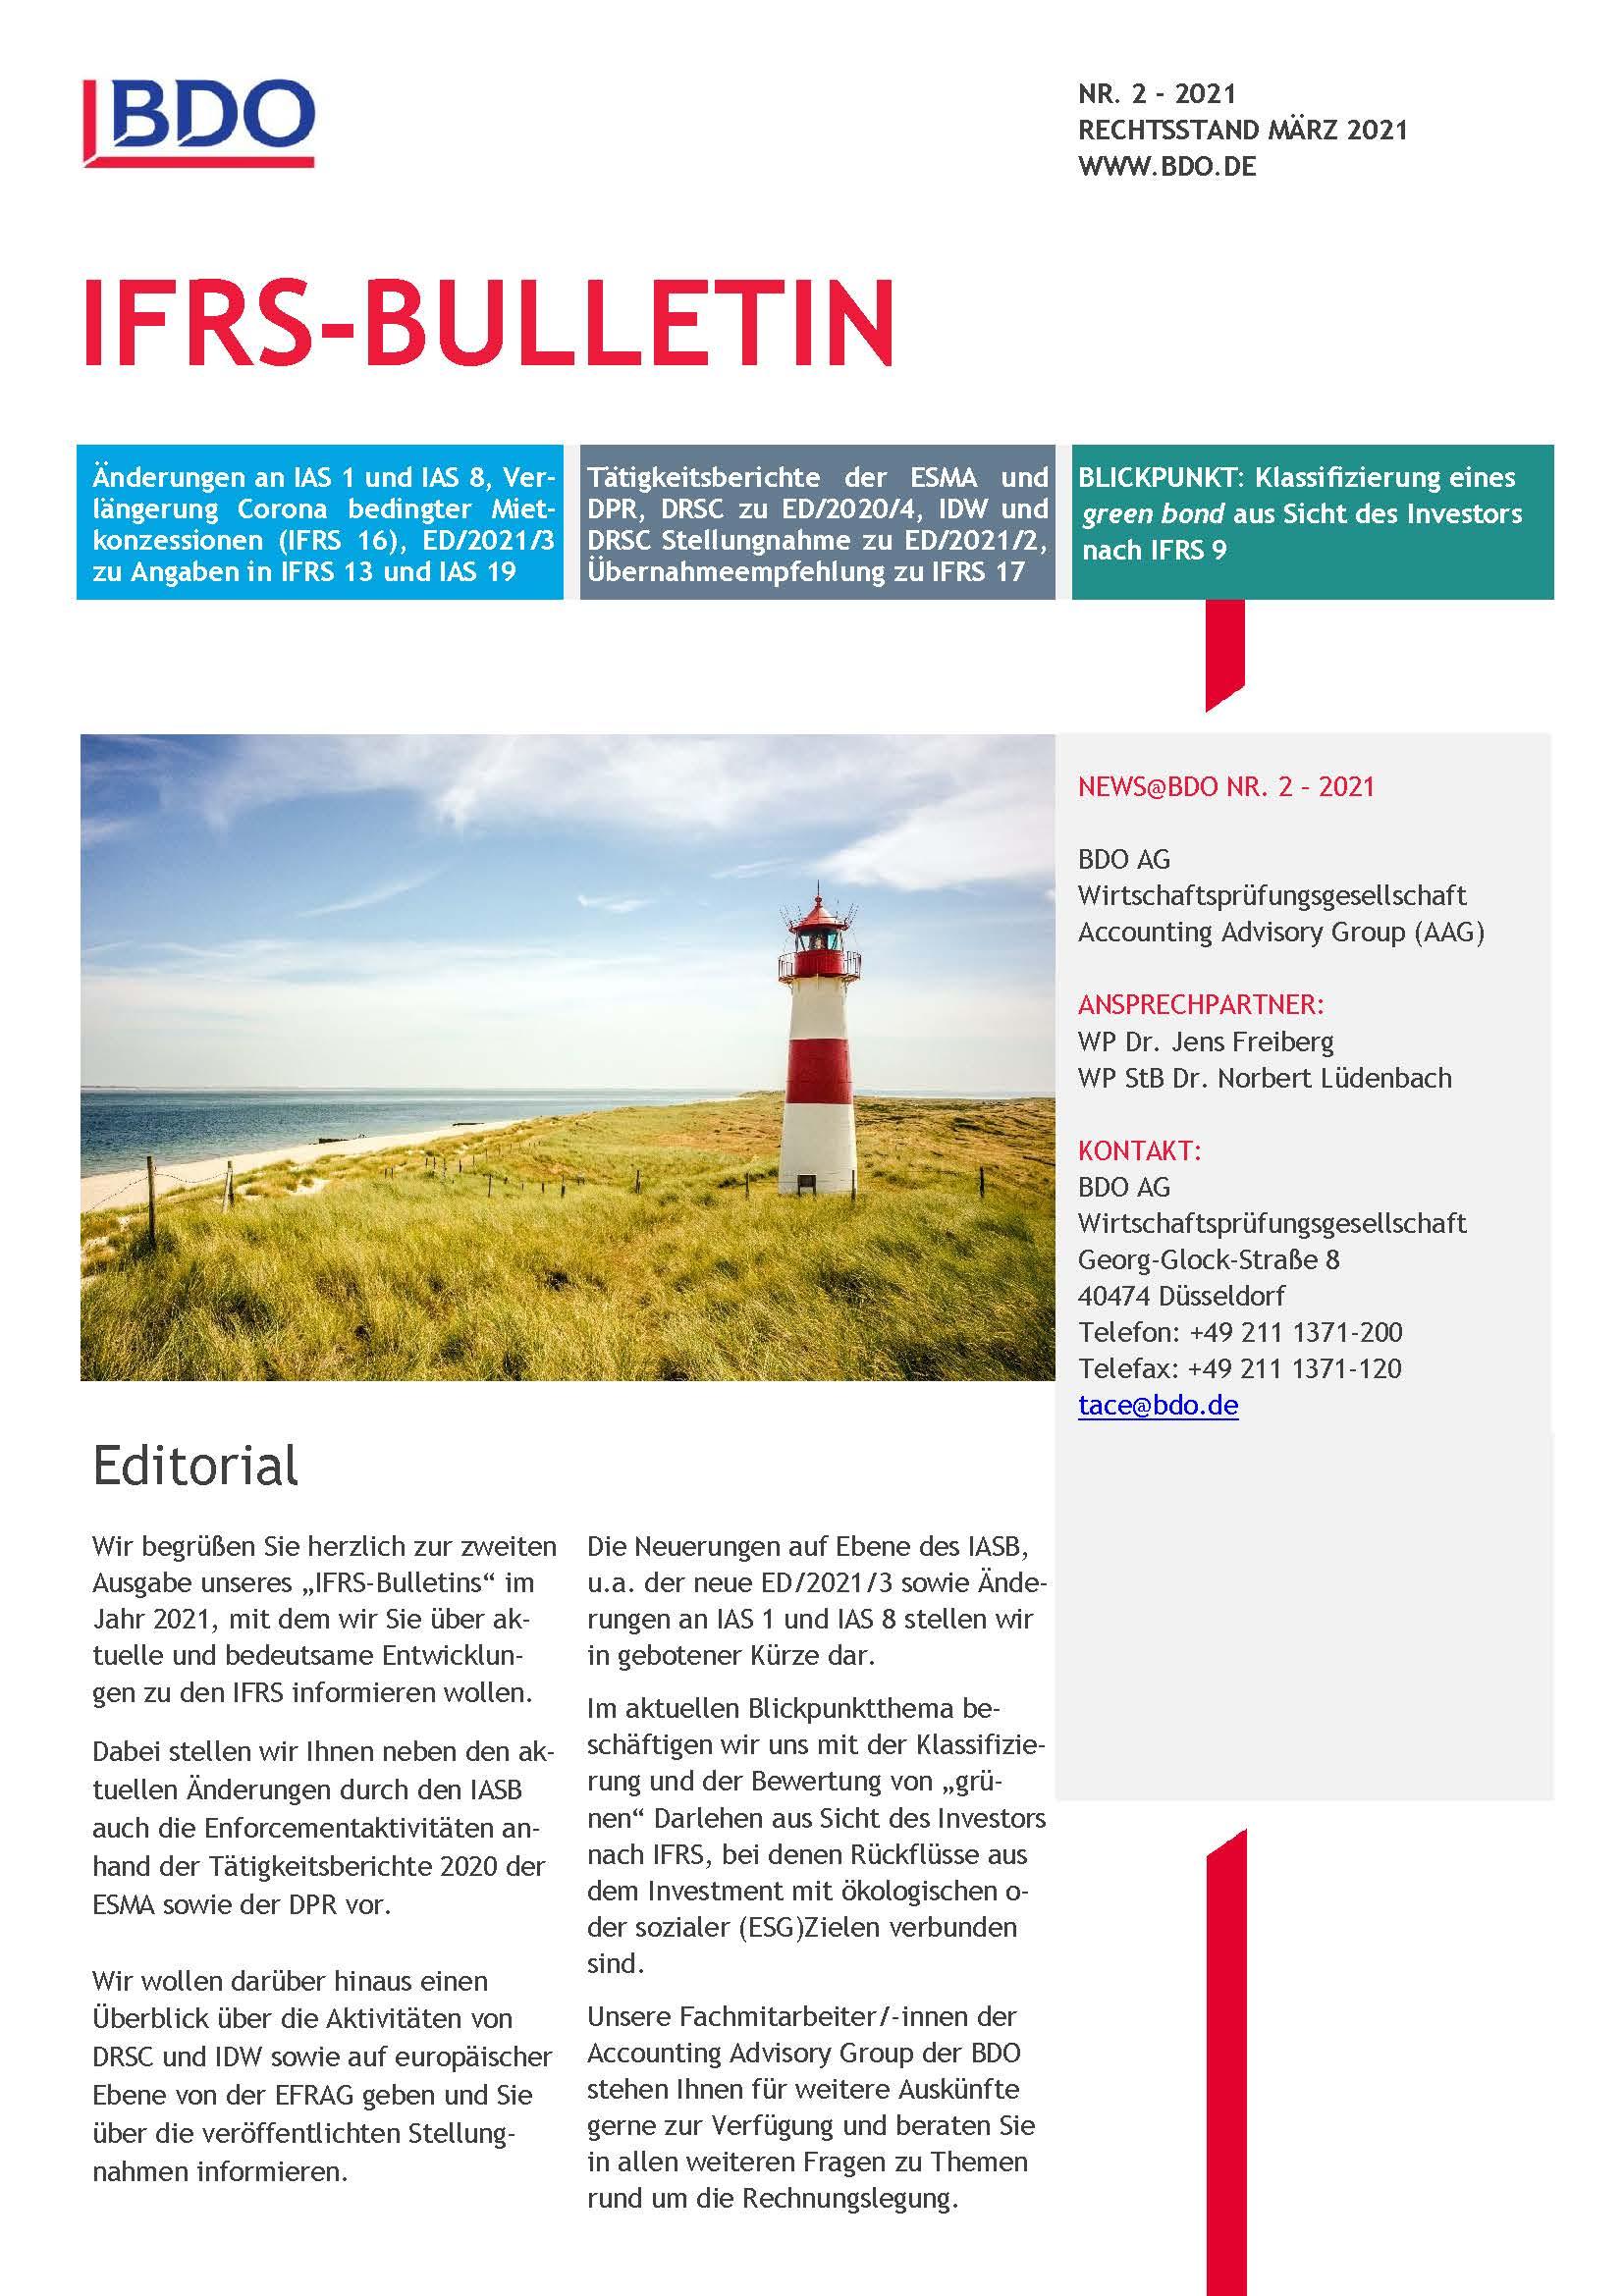 IFRS Bulletin